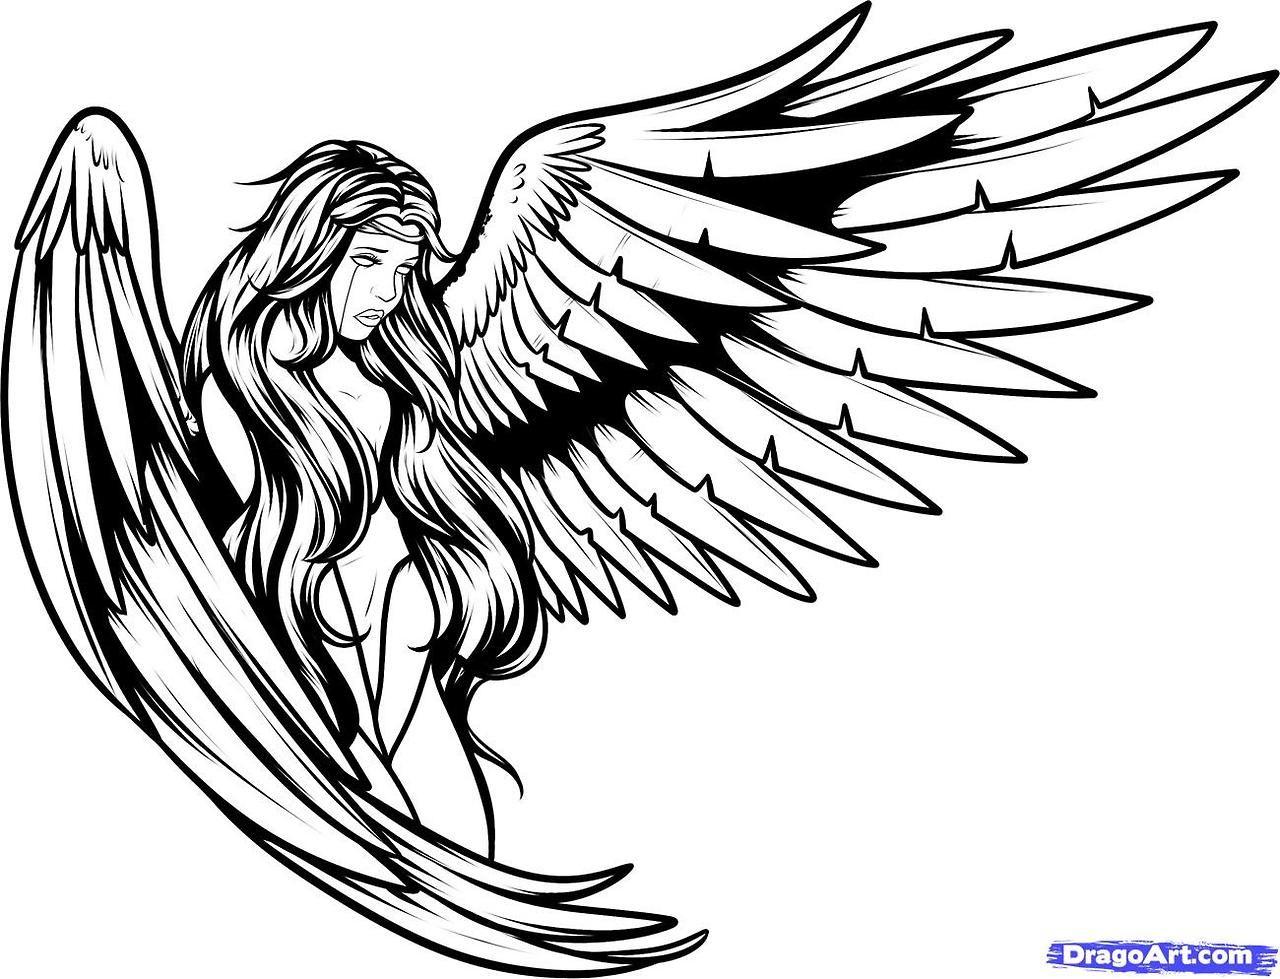 the lost soul tattoos angel designs wings tattoo angel tattoos pinterest soul. Black Bedroom Furniture Sets. Home Design Ideas